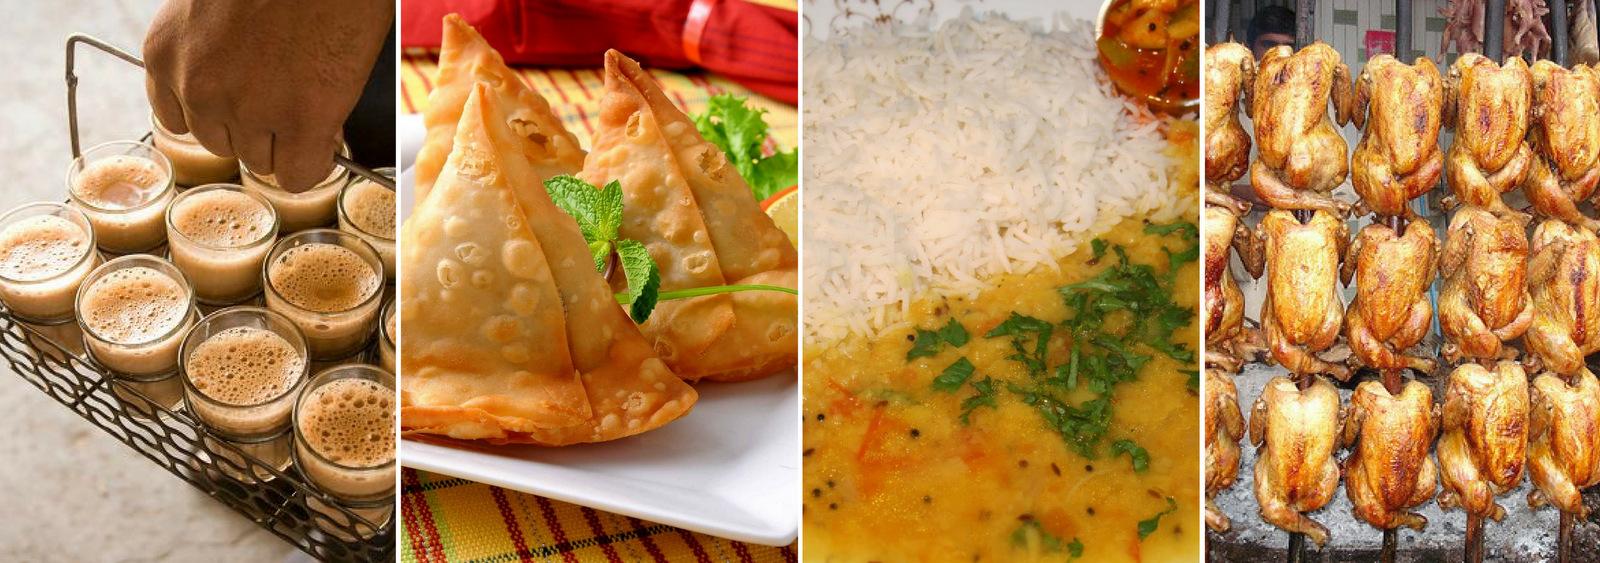 Street Side Food Restaurants known as Dhabas in Lahore